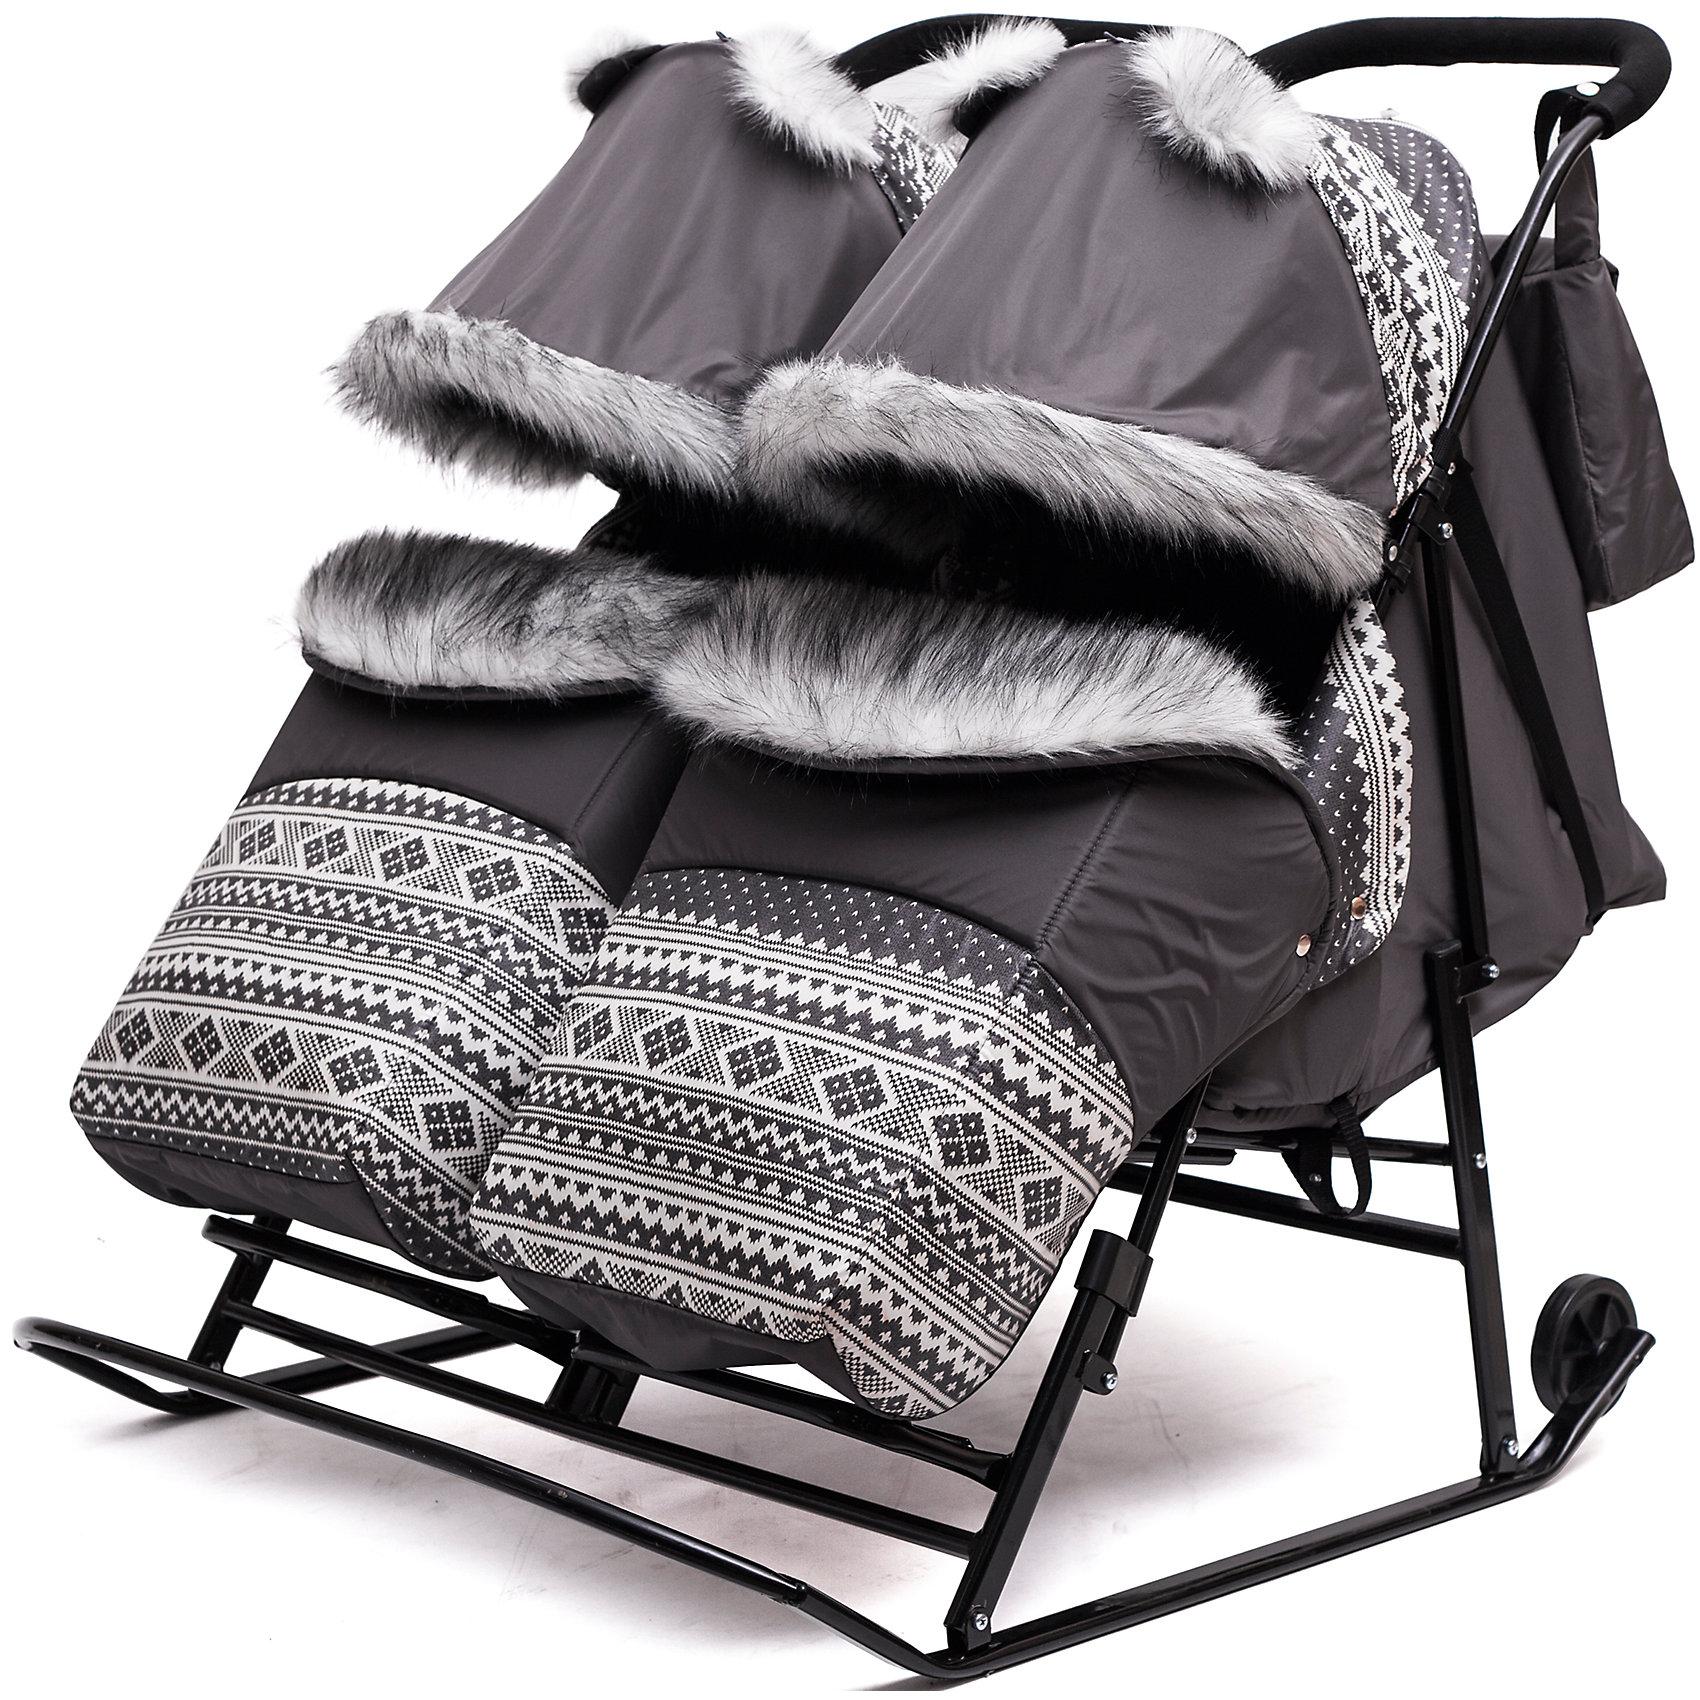 Скандинавия Санки-коляска для двойни Скандинавия 2УВ Твин, черная рама, ABC Academy, серый санки коляска abc academy скандинавия 1718 blue dark grey